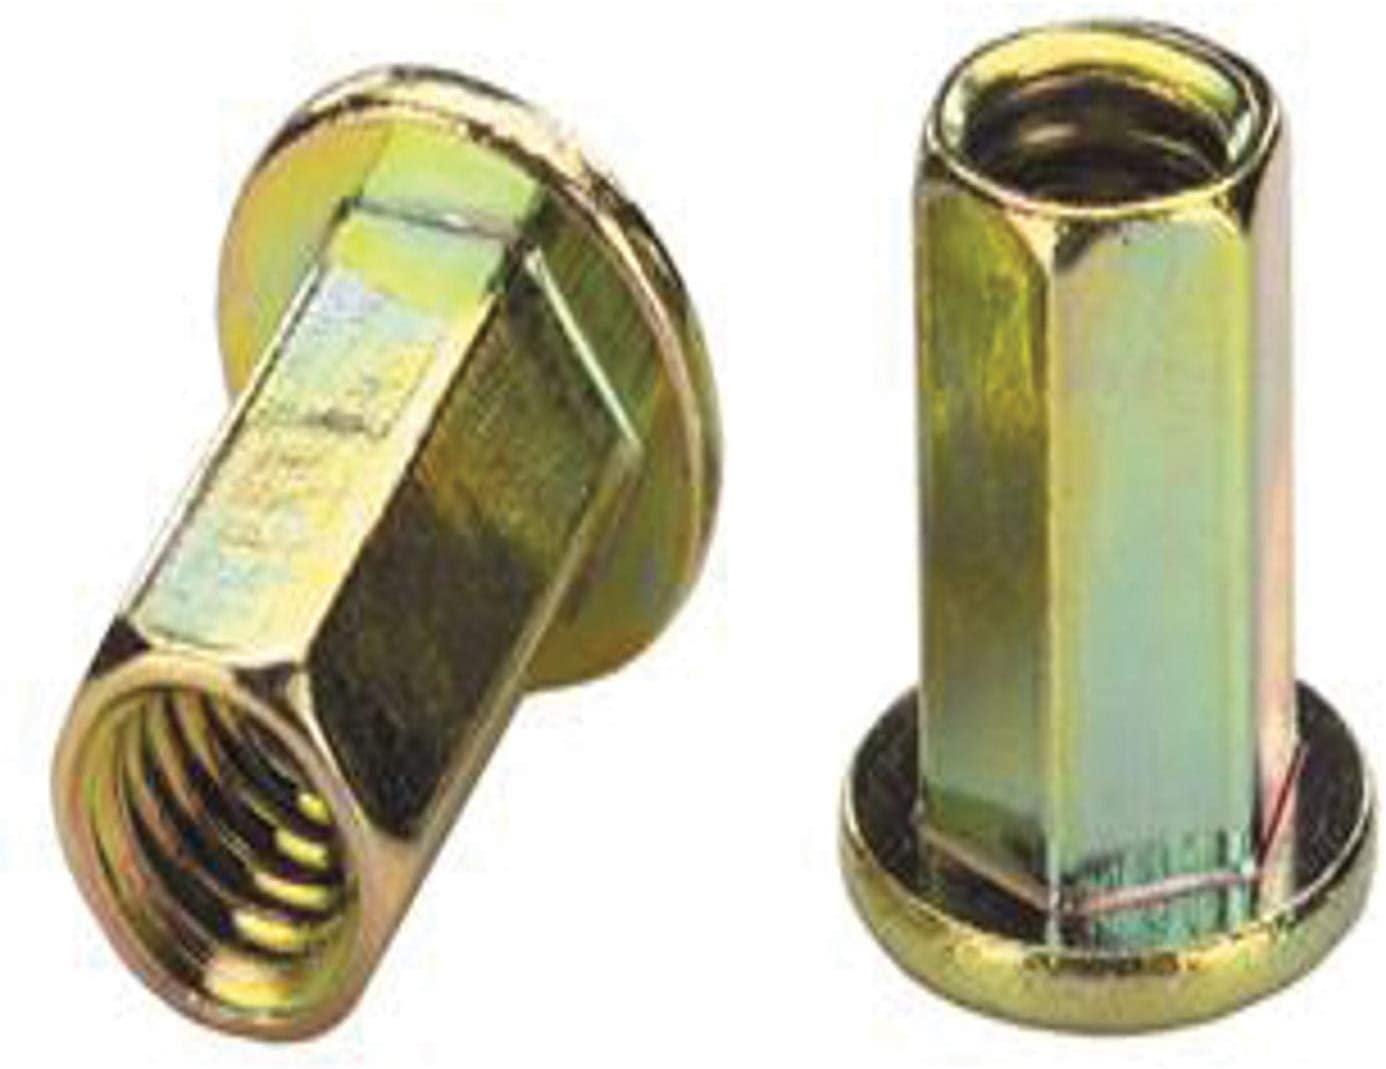 AES25H145ZYR, RIVETNUT, 1/4-20 (.085-.145 GR) Full-Hex Body, LG FLNG HD, Steel, Zinc YLW (100 PK)